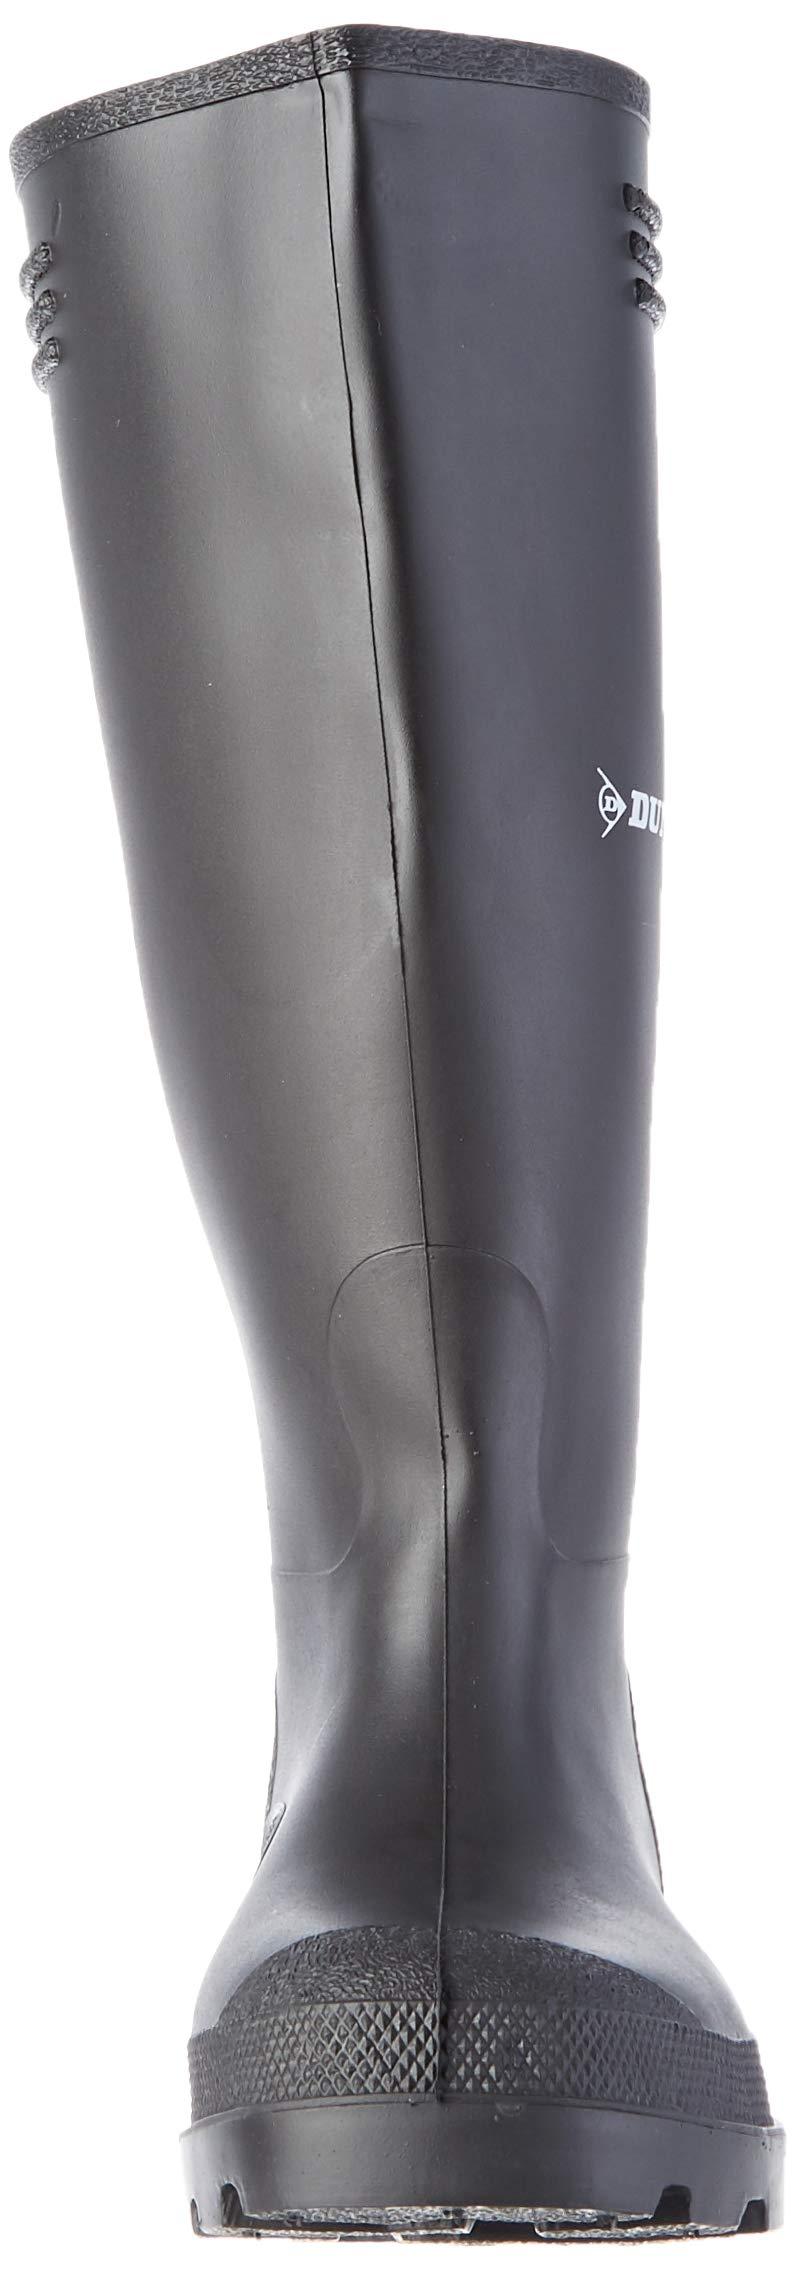 Dunlop Protective Footwear Pricemastor, Unisex Adults' Wellington Boots, Black, Size 7 UK (41 EU) 4